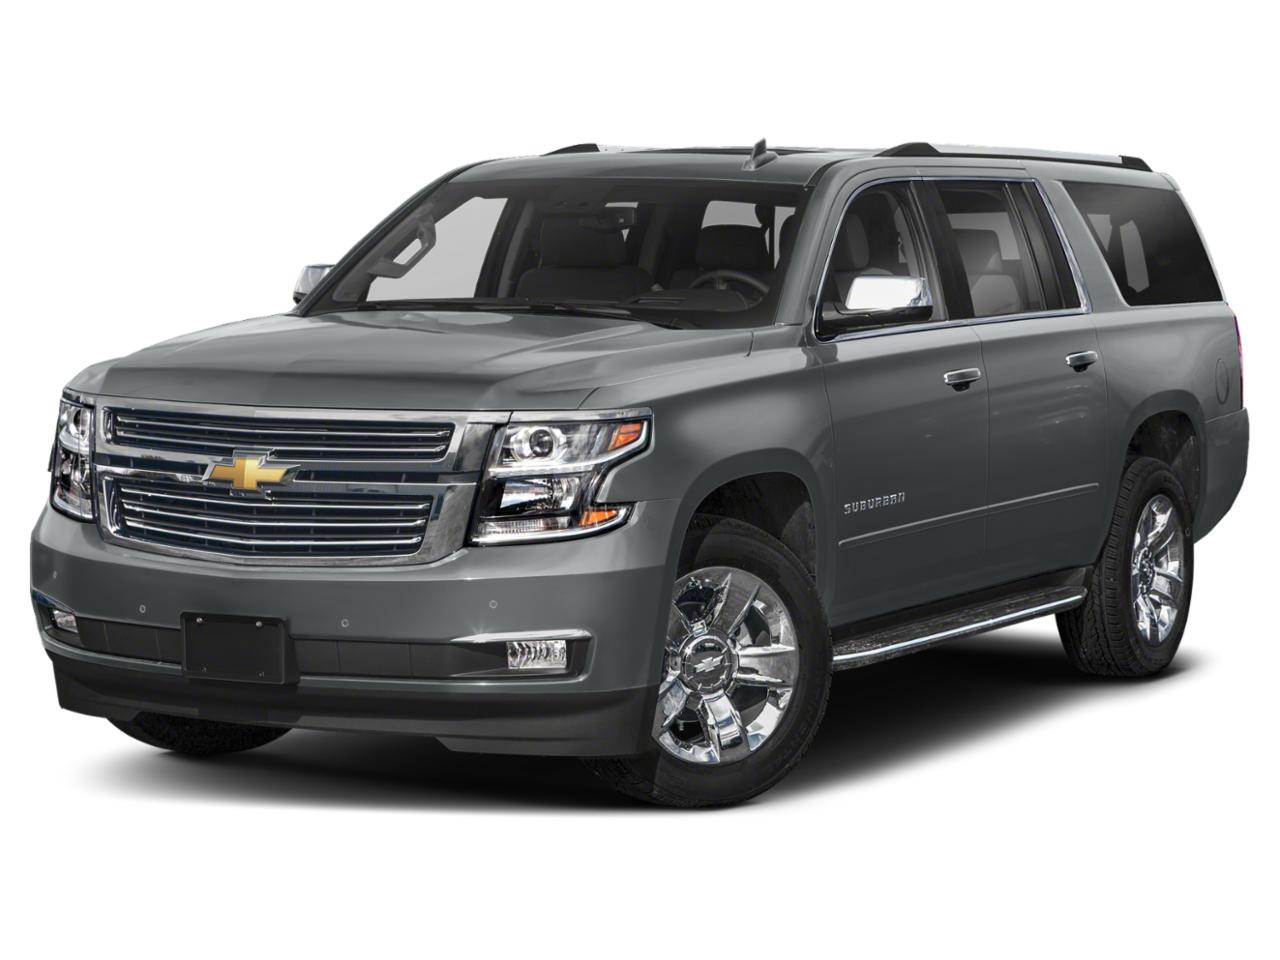 2020 Chevrolet Suburban Vehicle Photo in Owensboro, KY 42303